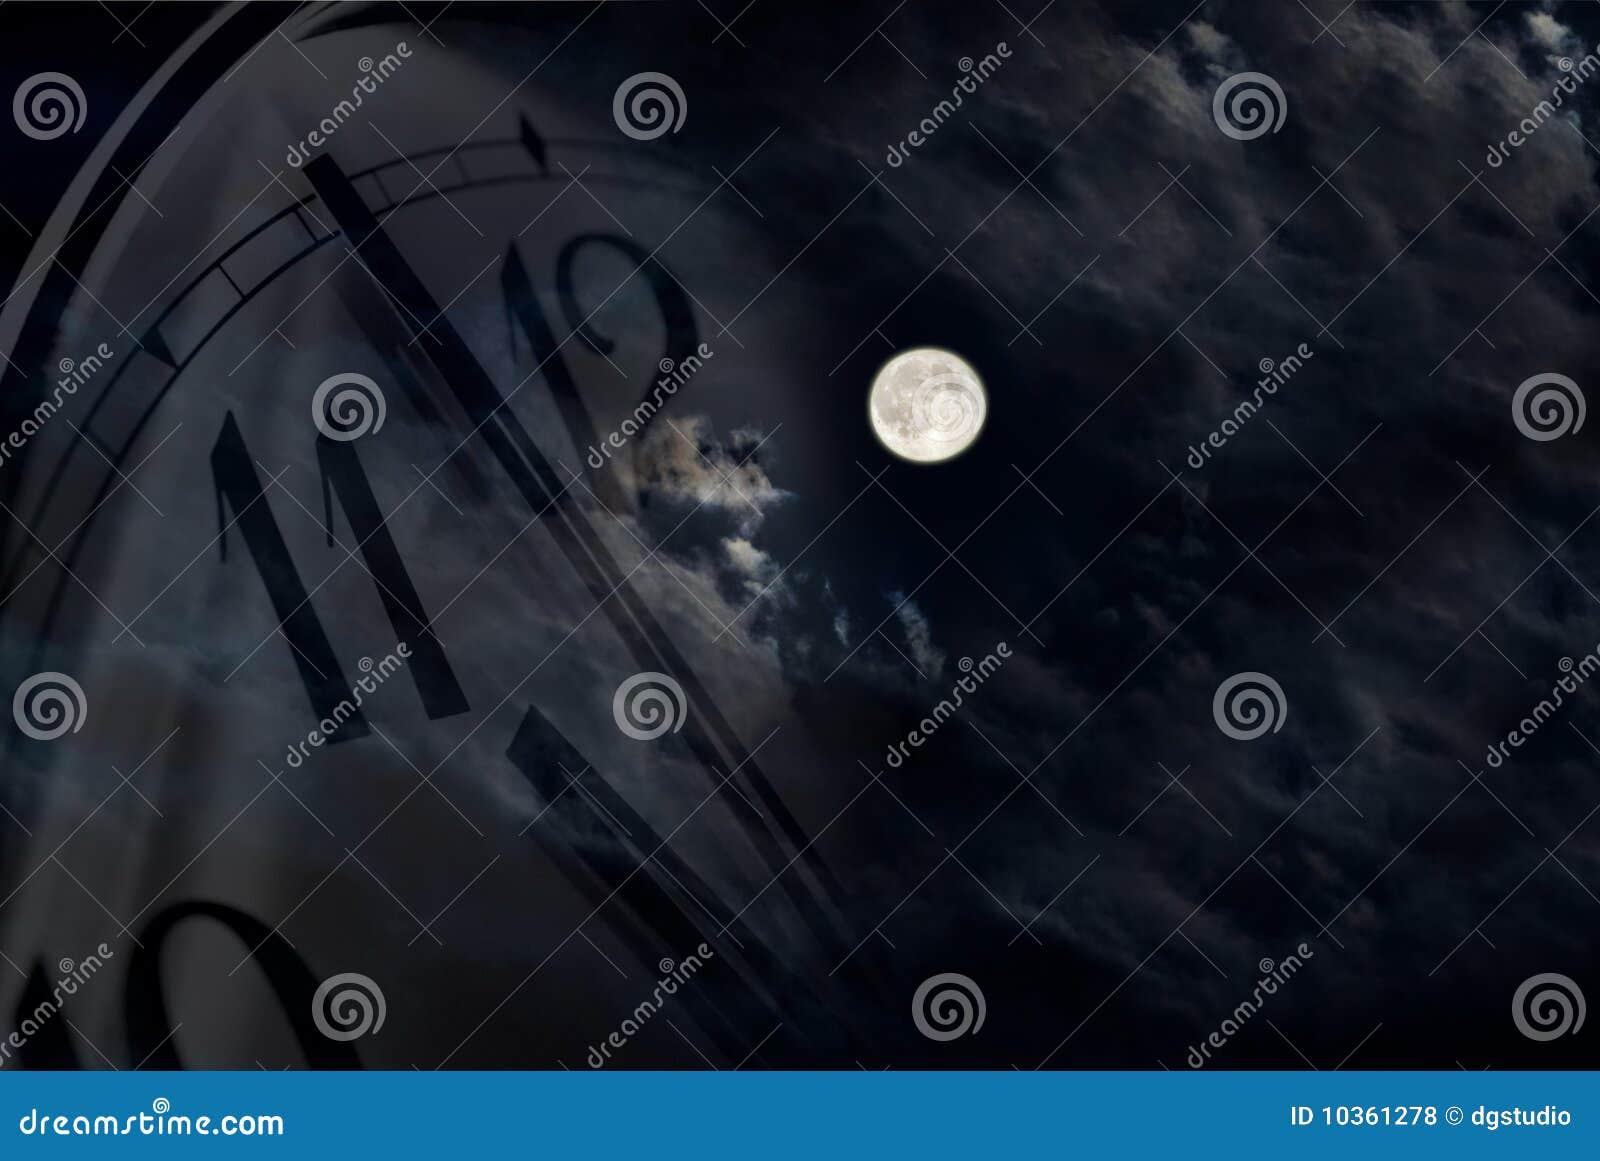 Moon and clock